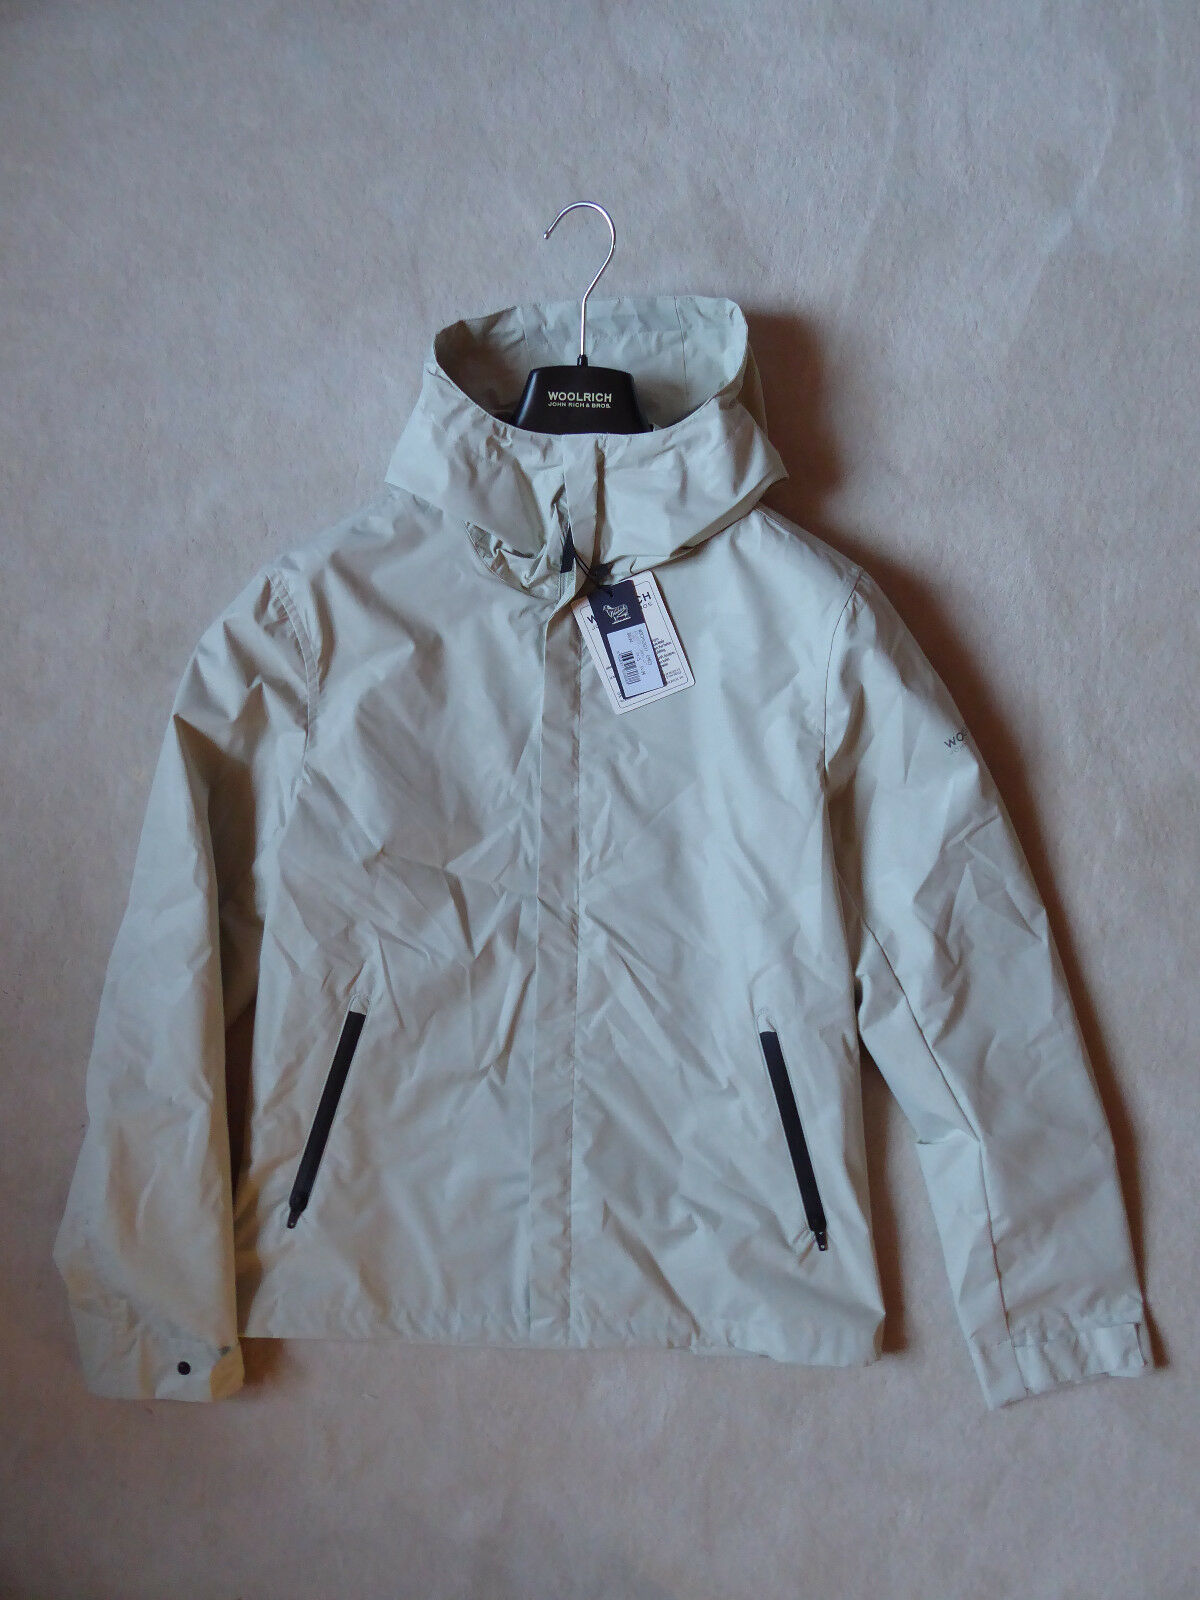 Woolrich Atlantic Camou Jacket White Igloo Camou - WOCPS2637 EM03 8694 NEU